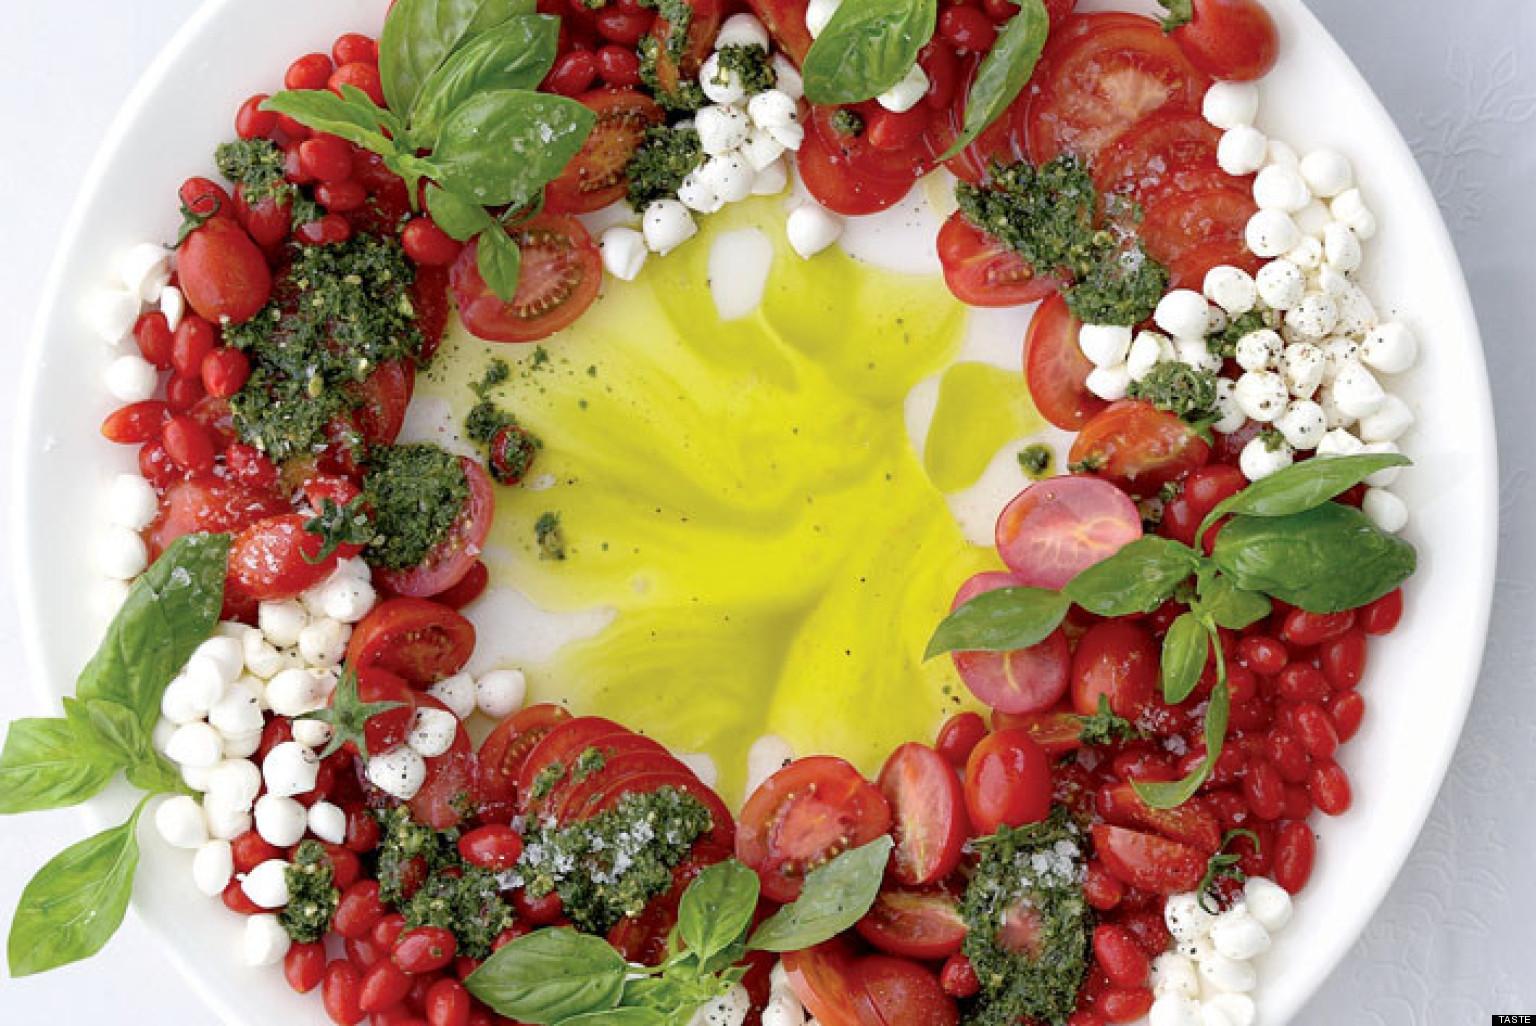 Italian Christmas Dinner Recipes  Italian Christmas Recipes PHOTOS